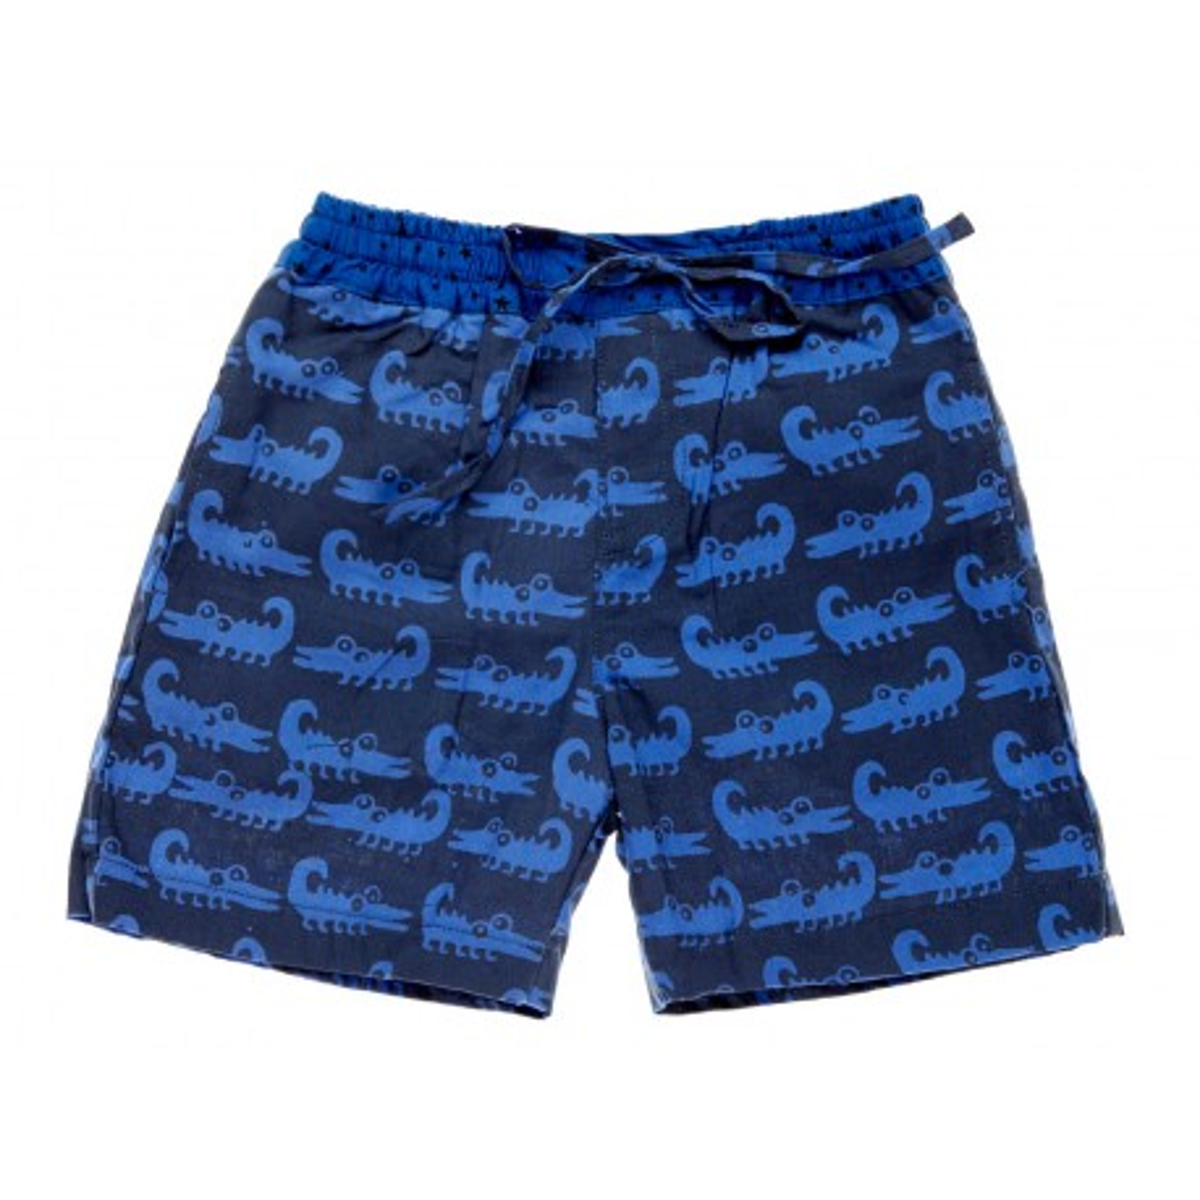 Short de bain 2-8 ans crocodile bleu